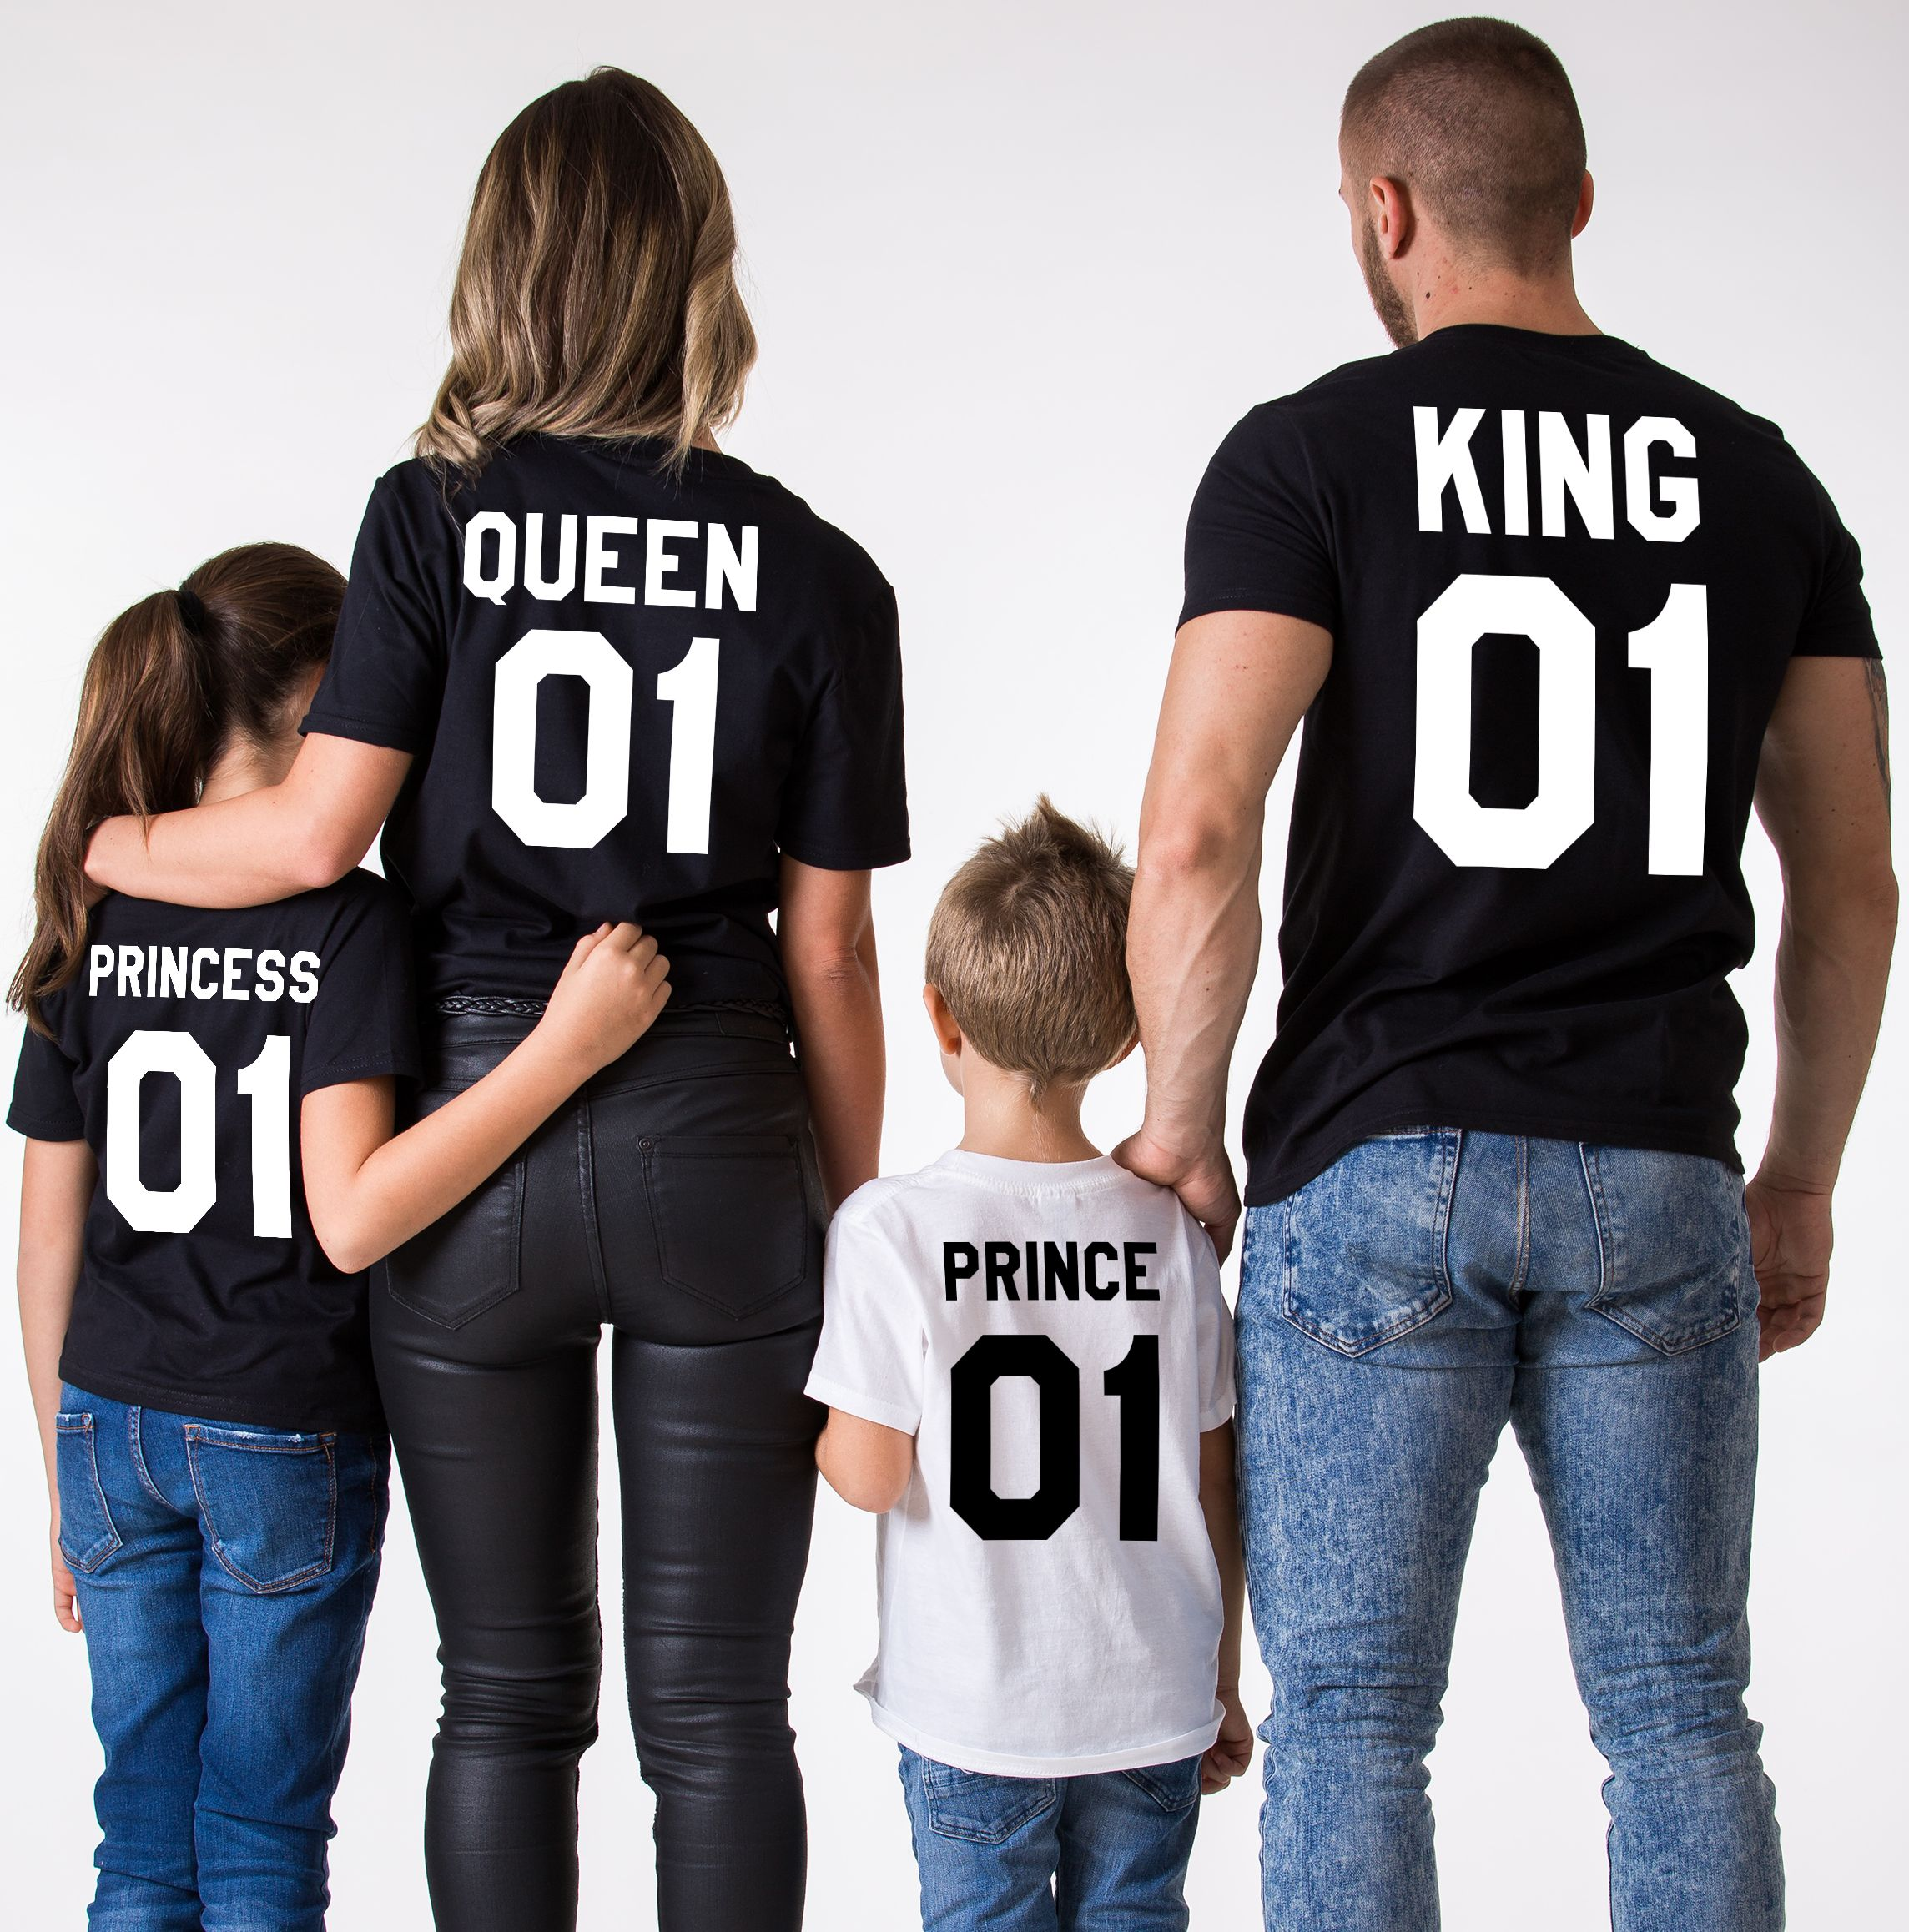 King queen prince shirts / King queen prince tshirts / King queen prince shirts / King queen prince shirt OvA5JuMFf7